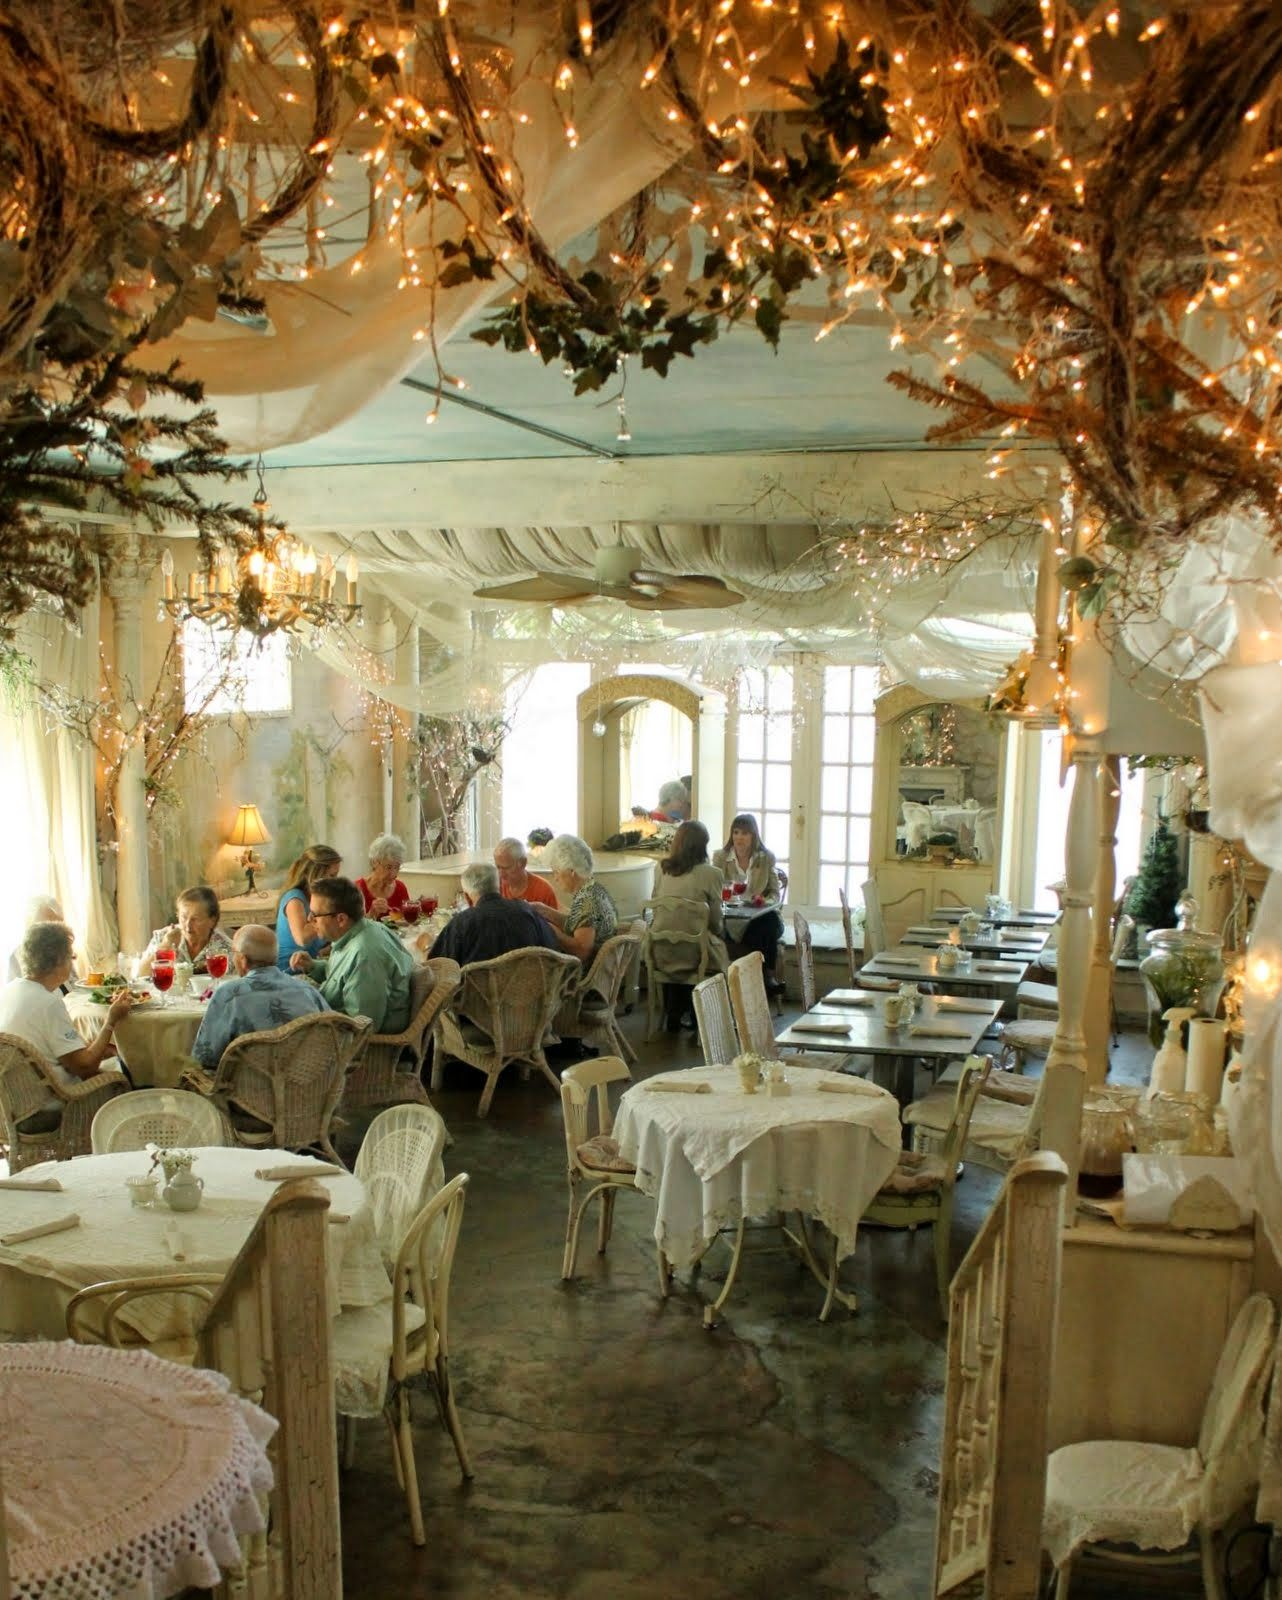 Shabby Chic Romantic Tea Room With Images Shabby Chic Tea